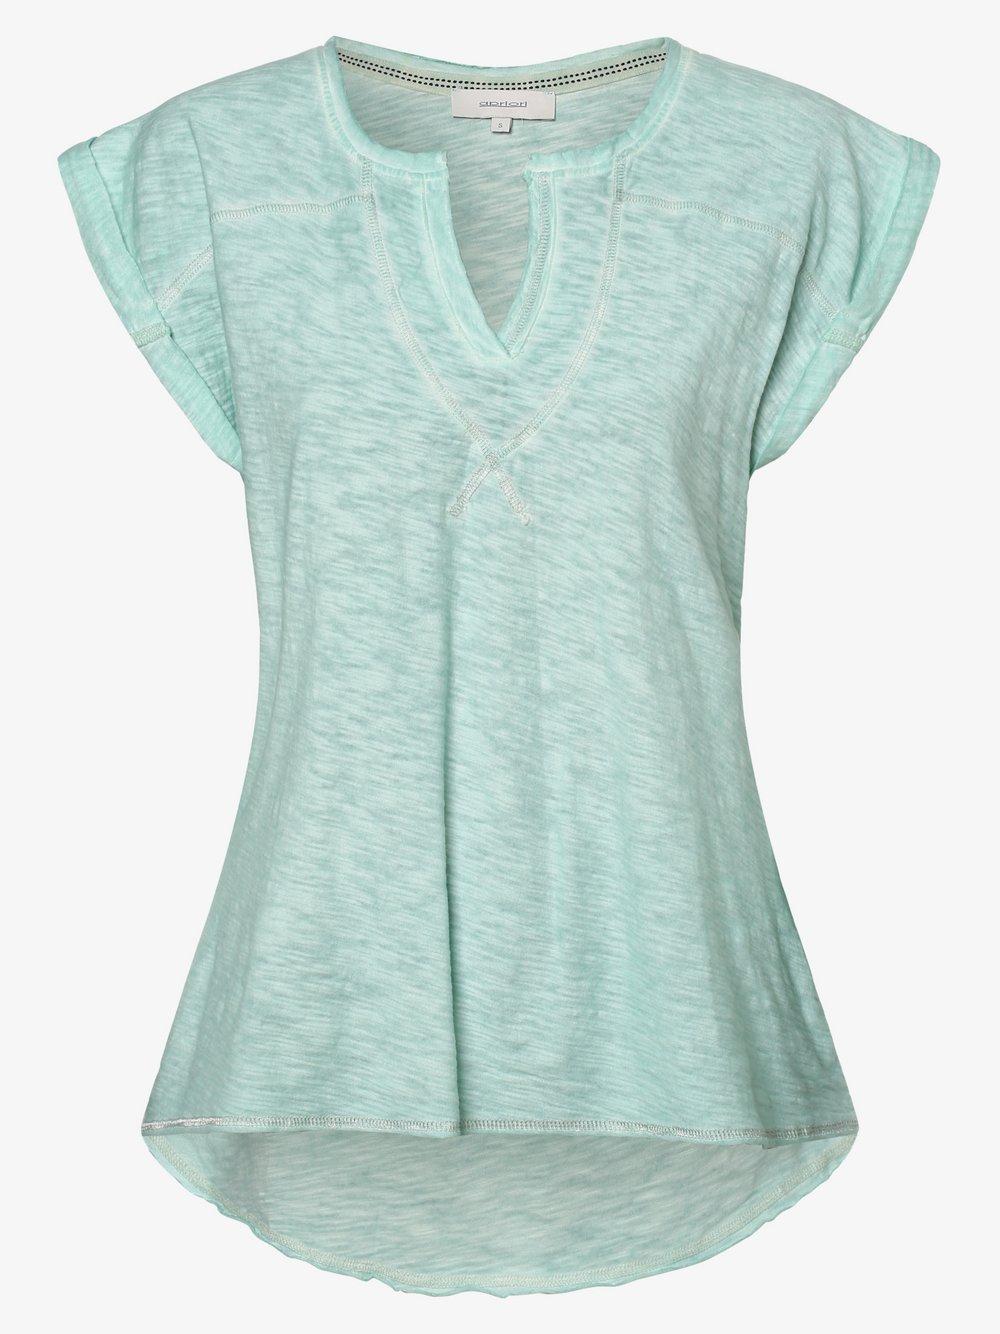 Apriori - T-shirt damski, zielony